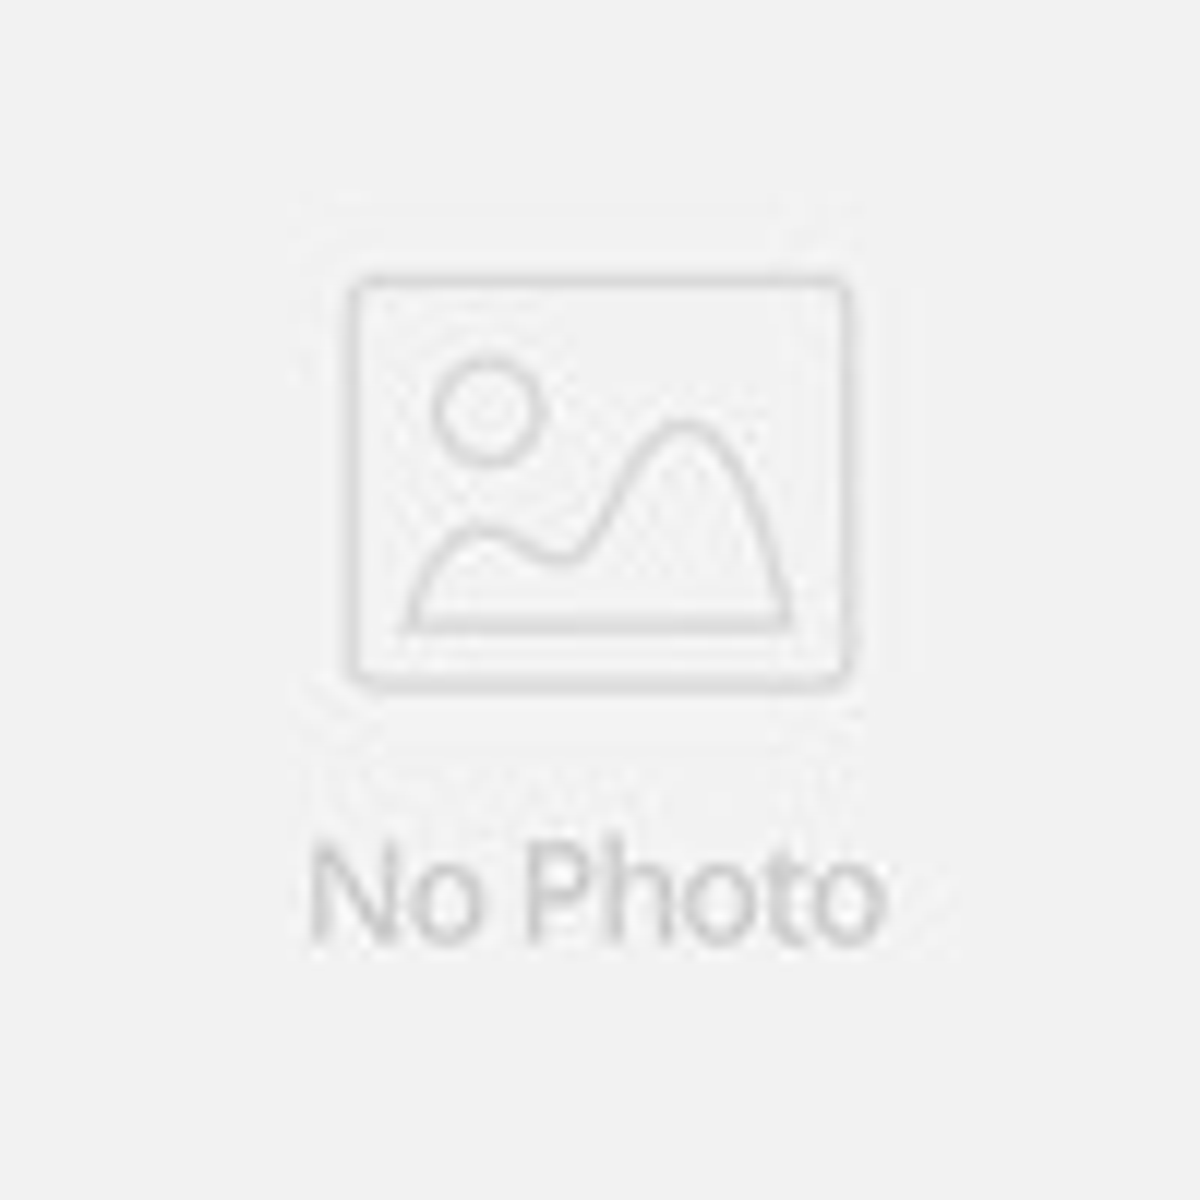 sexy vampire costume sexy vampire costume(China (Mainland))